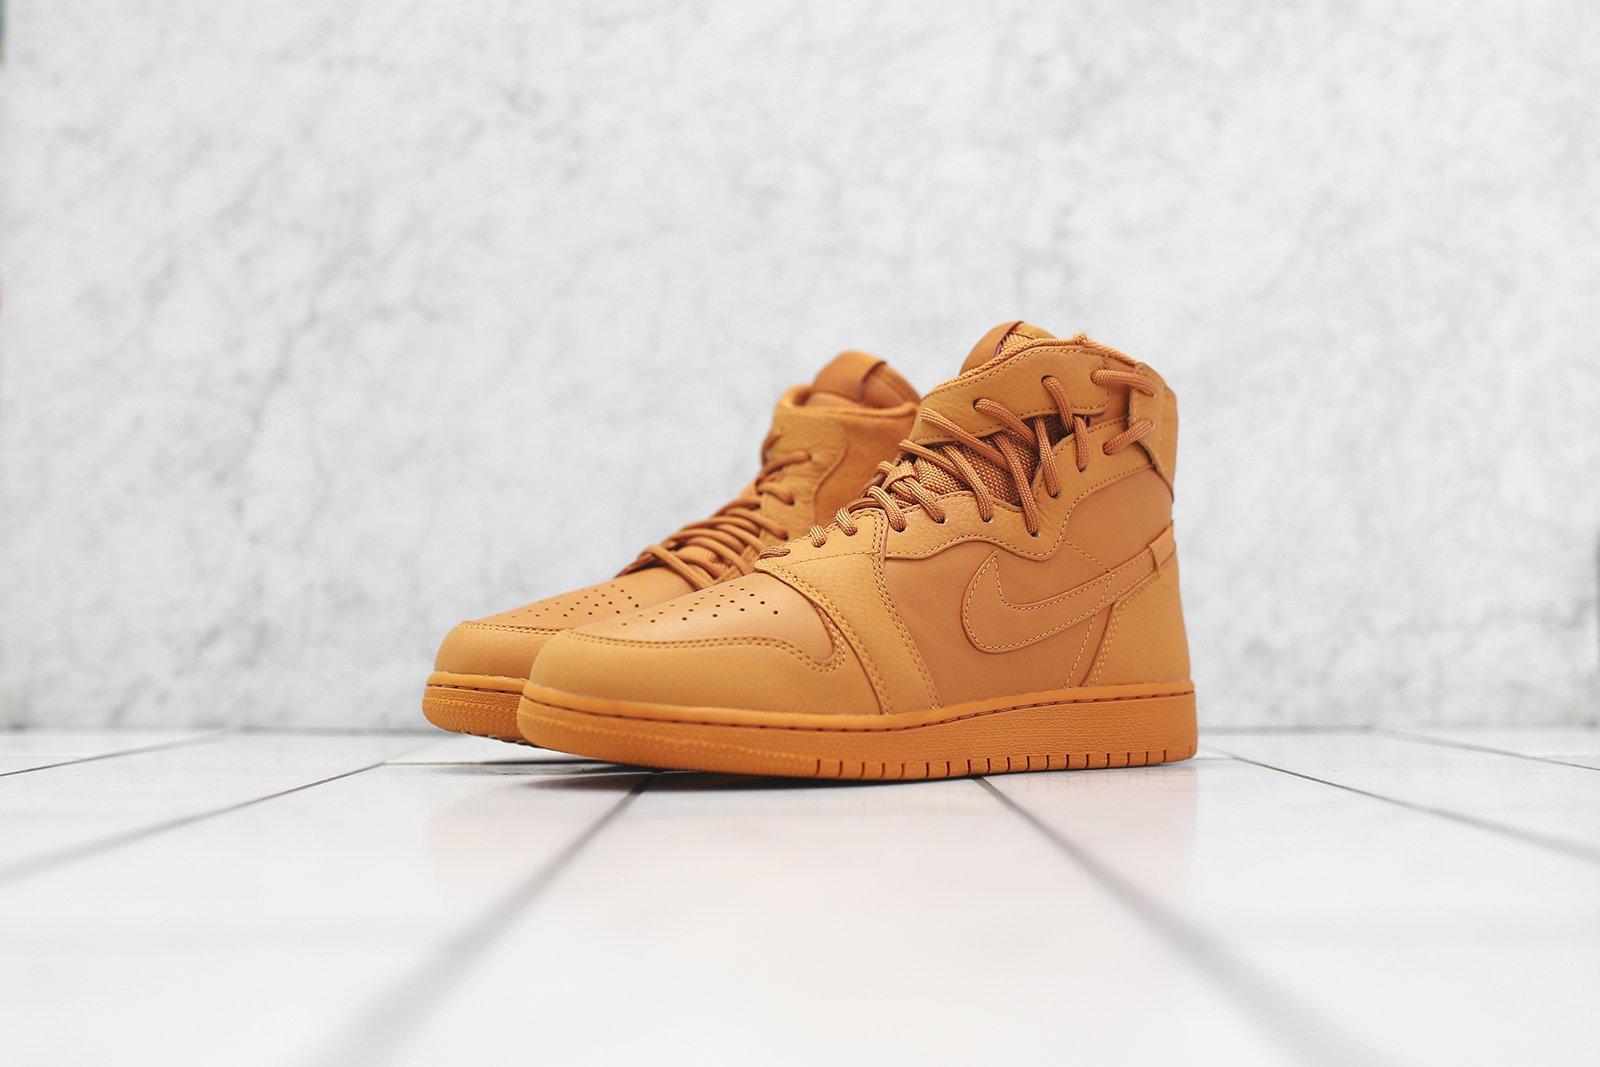 Nike WMNS Air Jordan 1 Rebel XX